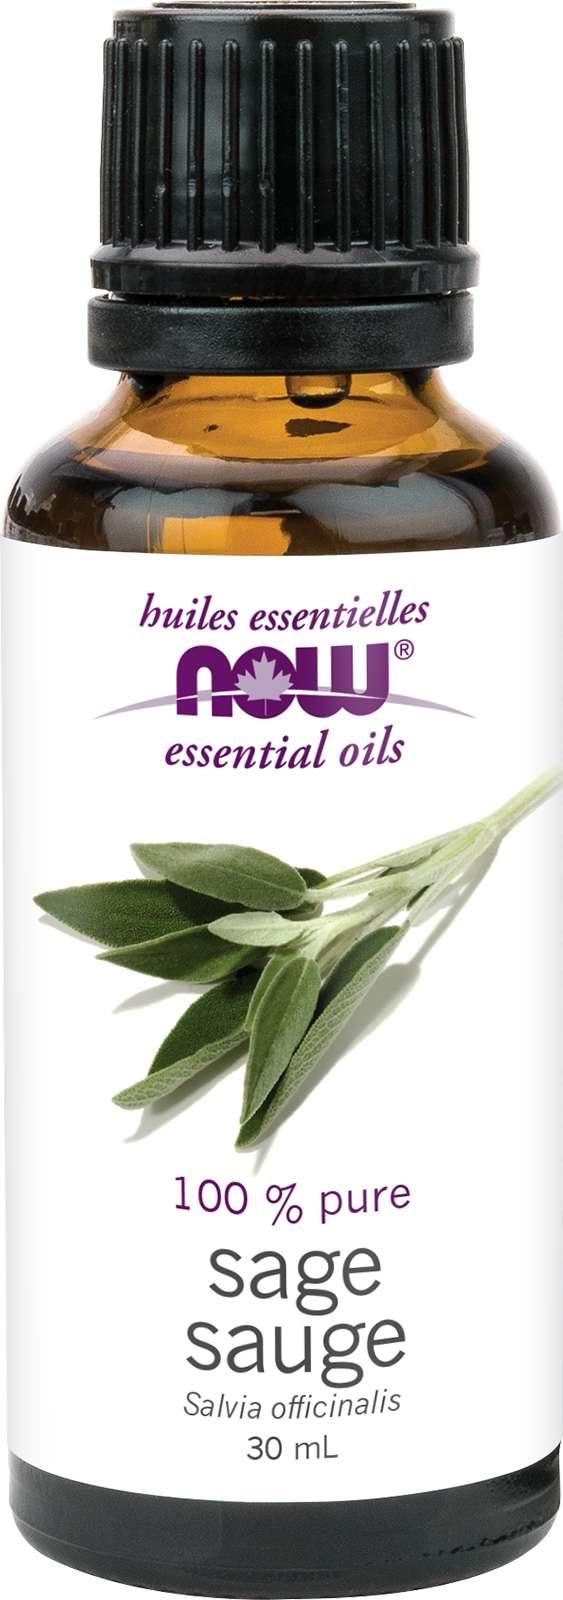 Sage Oil (Salvia officinalis) 30mL